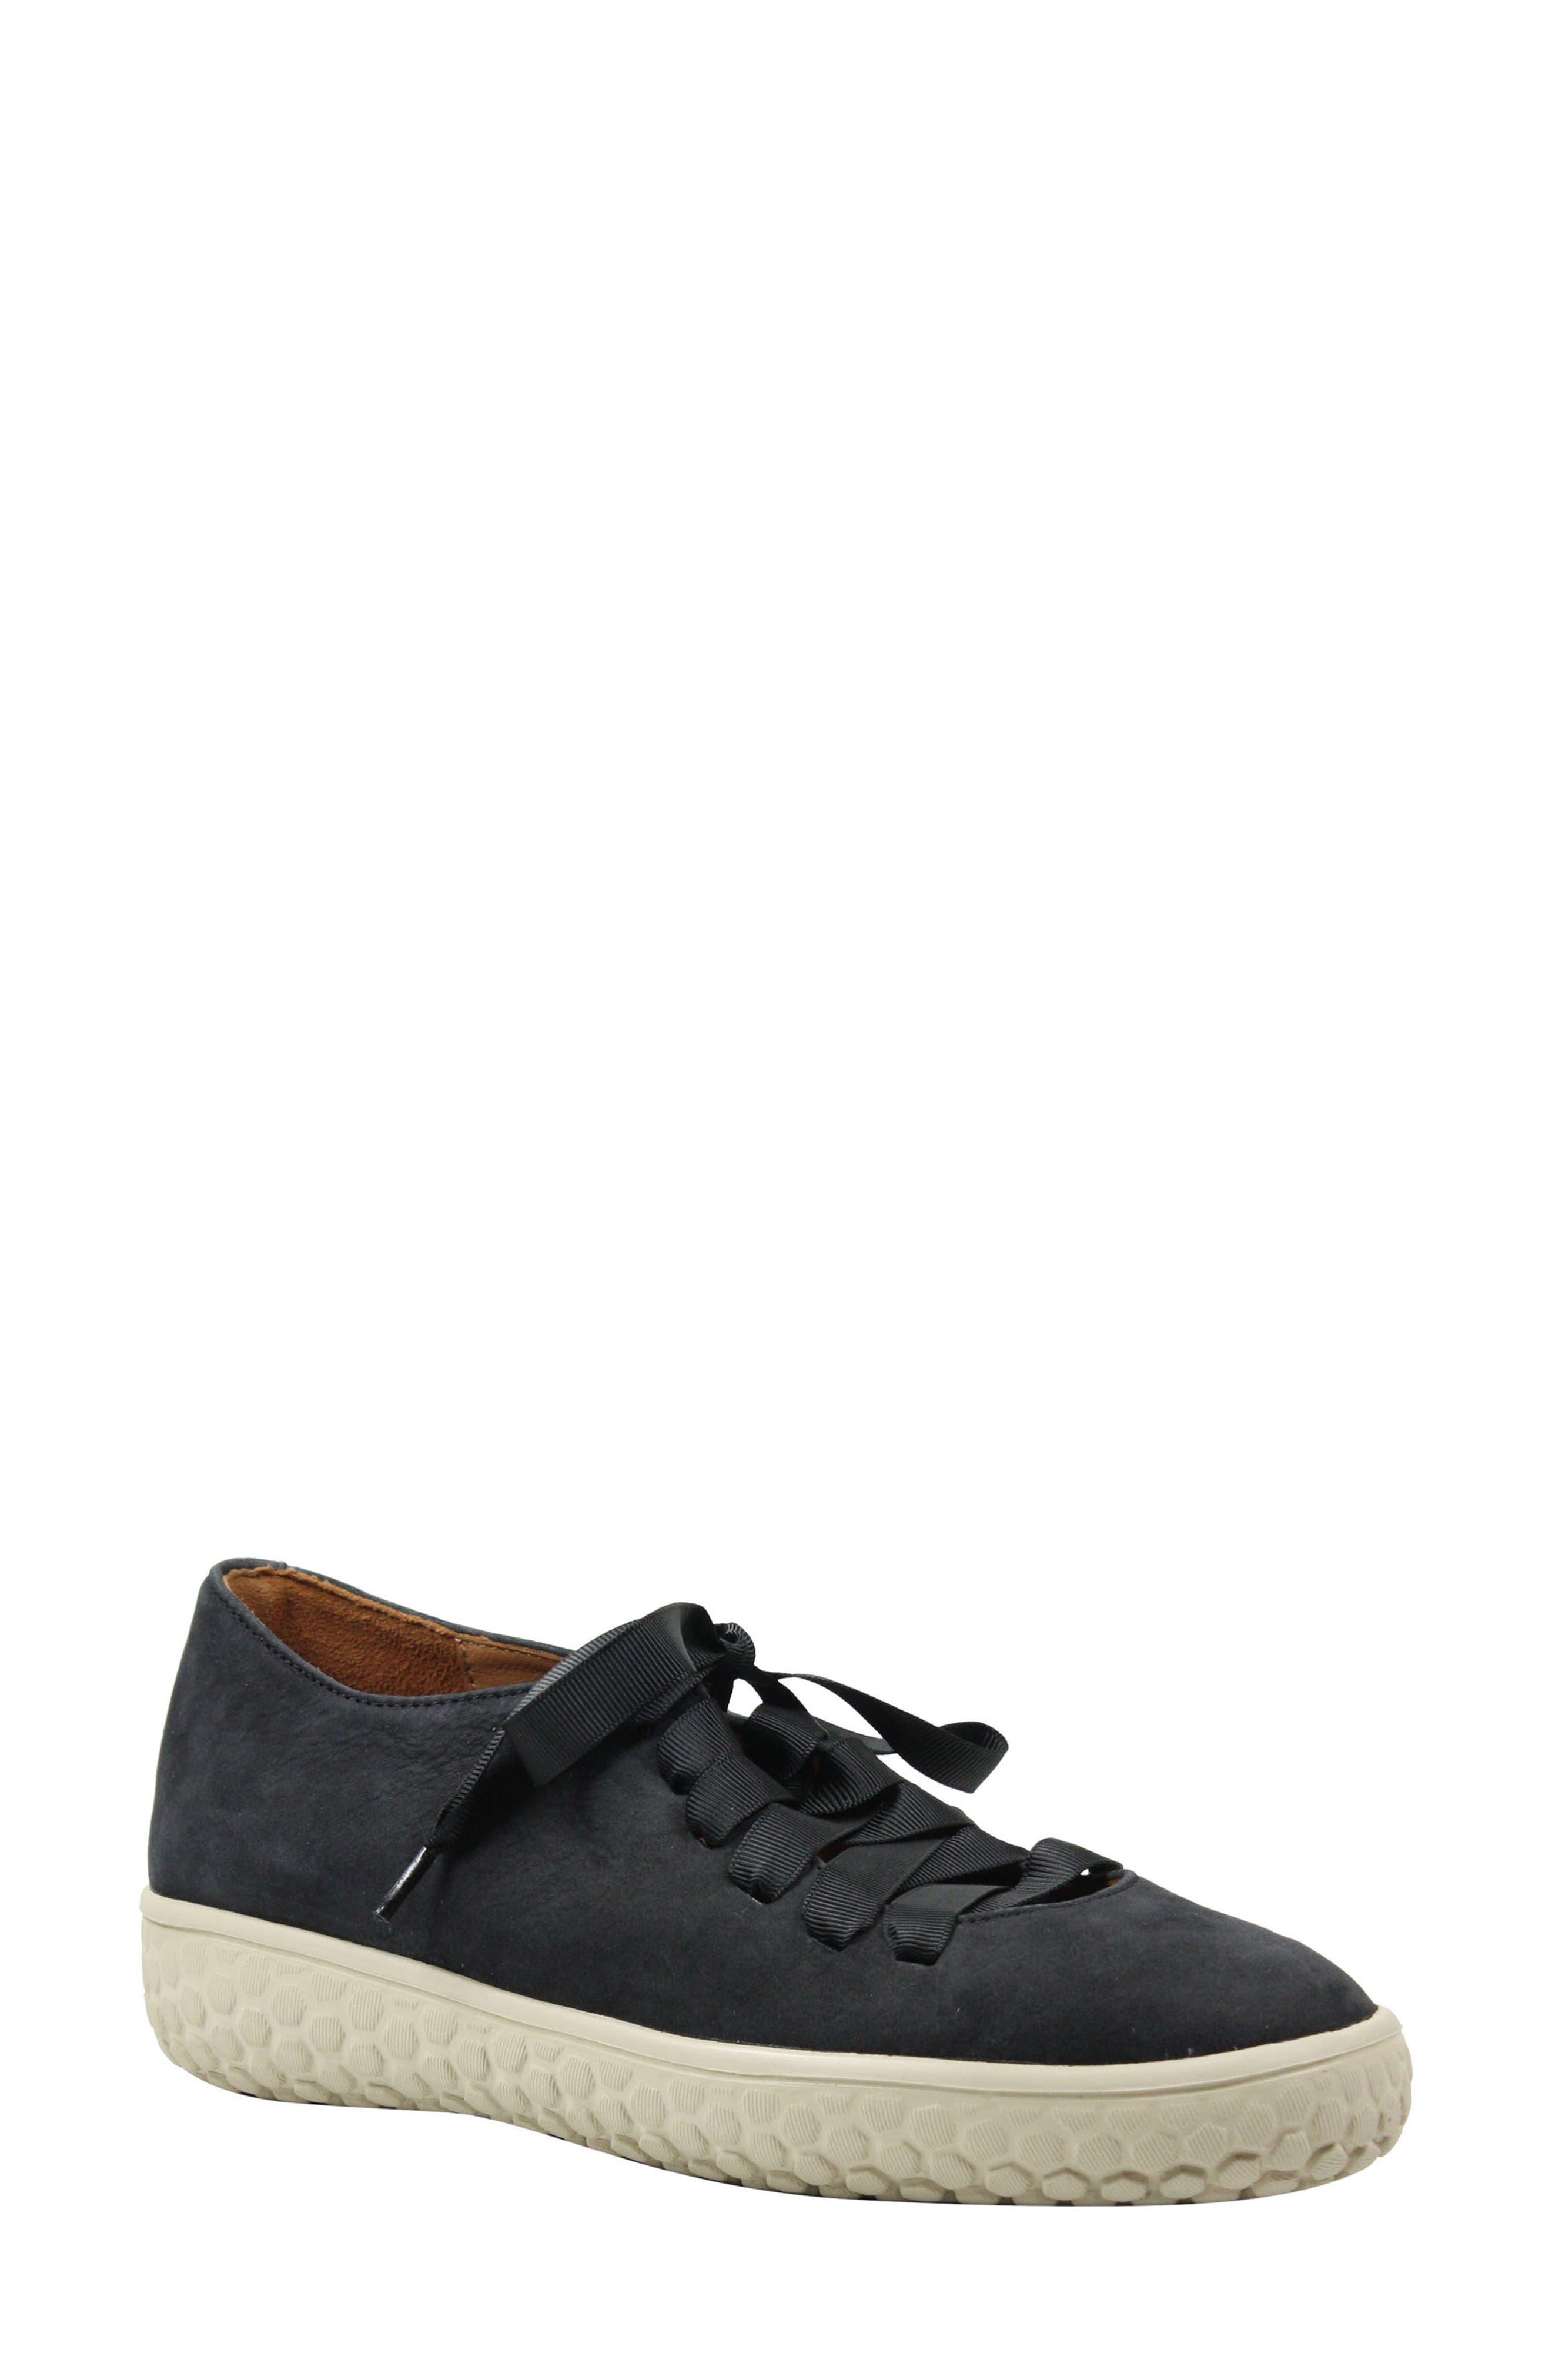 Zaheera Sneaker,                             Main thumbnail 1, color,                             BLACK NUBUCK LEATHER